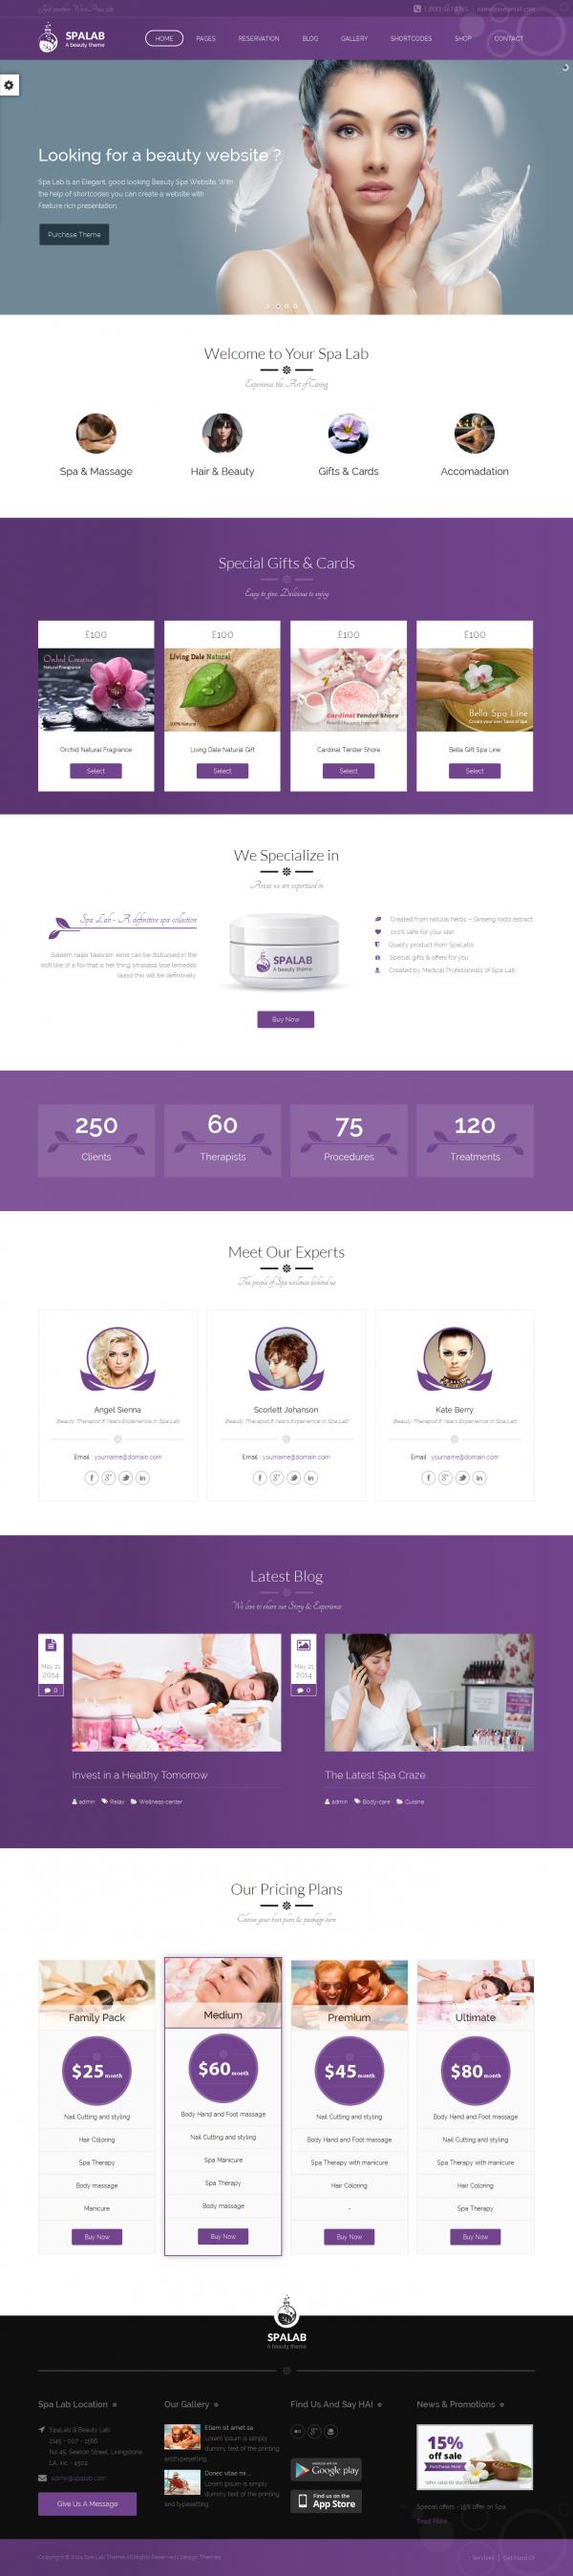 Thiết kế website thẩm mỹ viện, spa